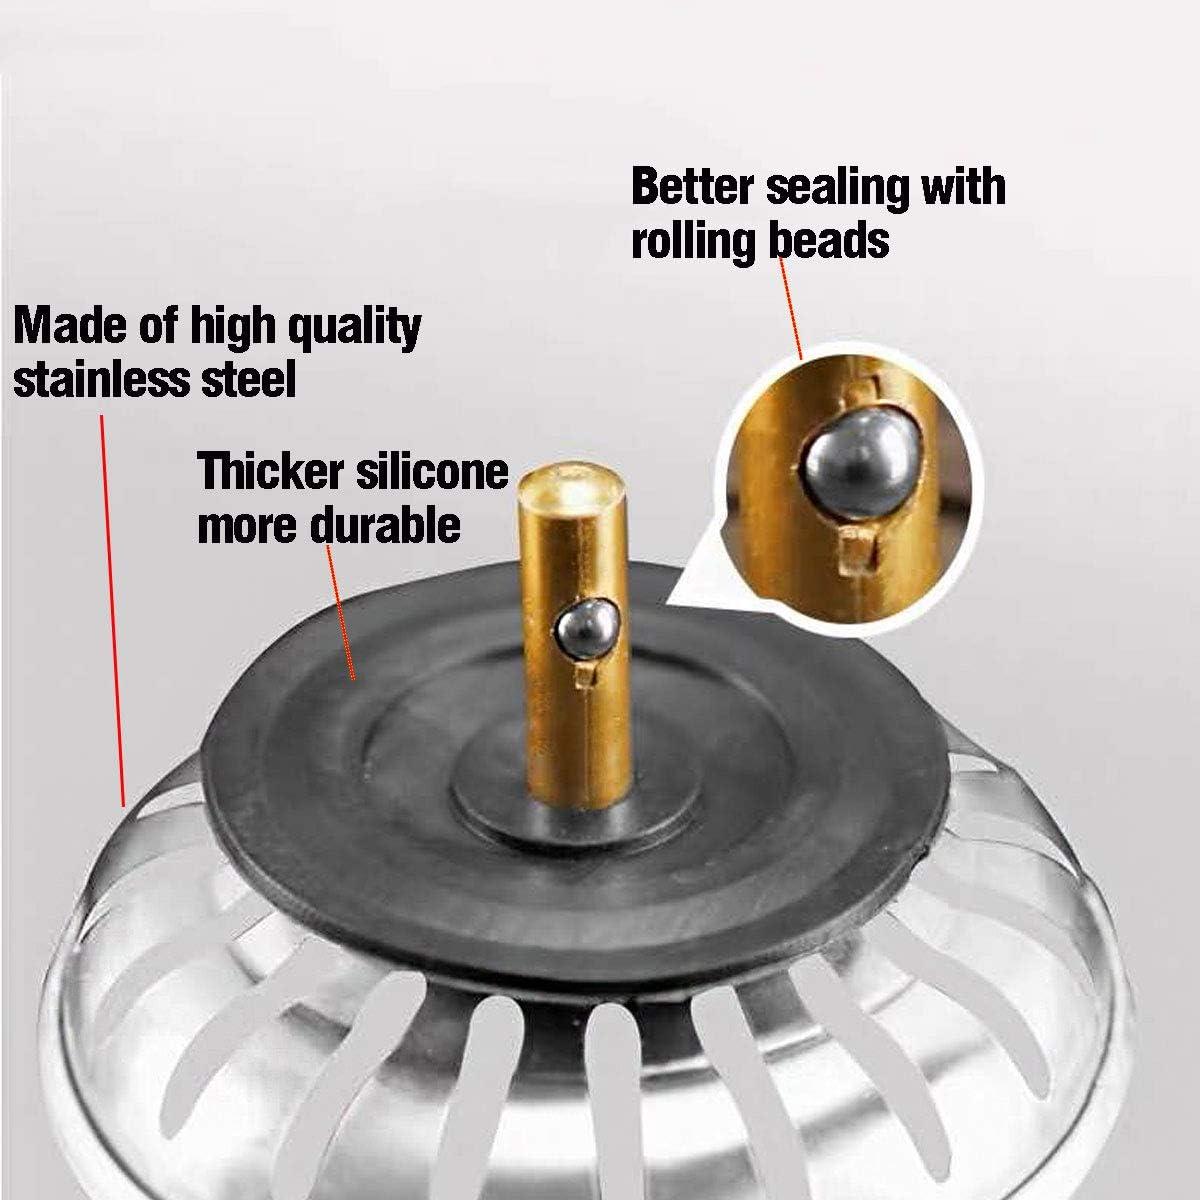 Kitchen Sink Plug for UK Sinks Stainless Steel Kitchen Sink Strainer Plug 304 Stainless Steel Rubber Seal Waterproof 78-84mm